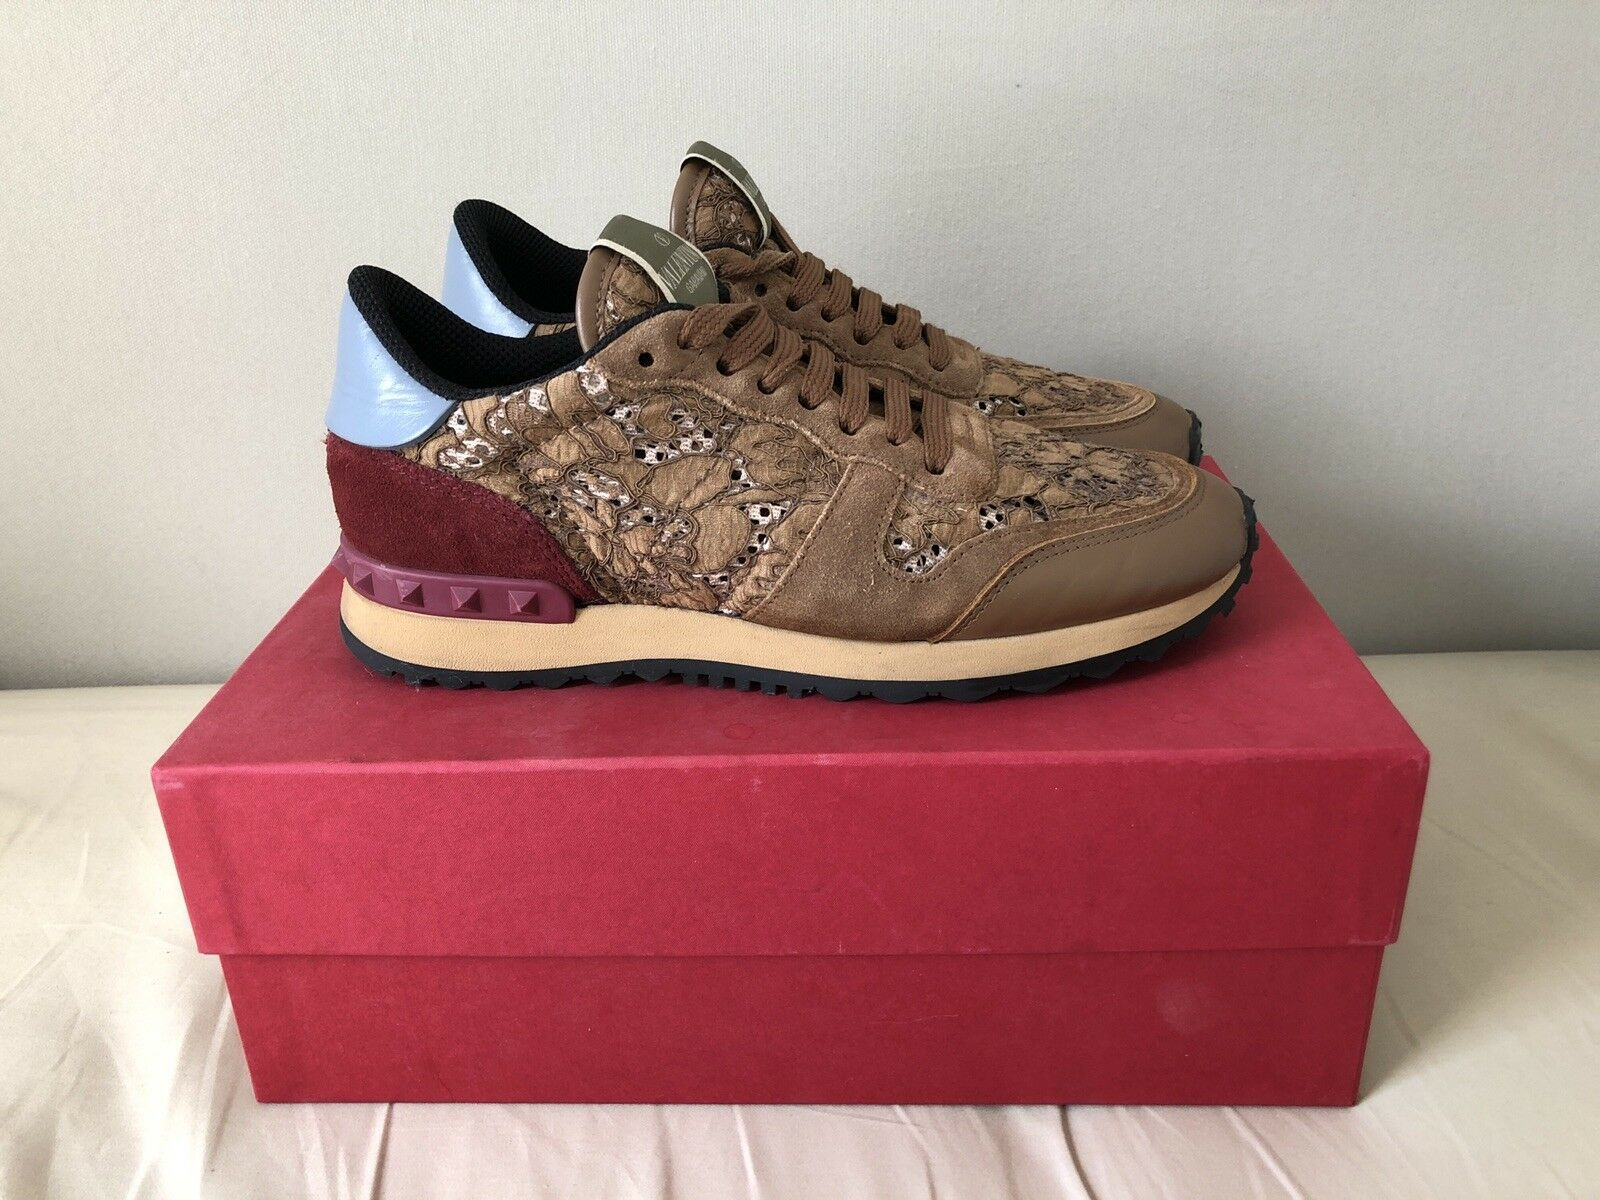 Herren Rieker Trekking Schuhe blau Größe 41 42 Sneaker 08065